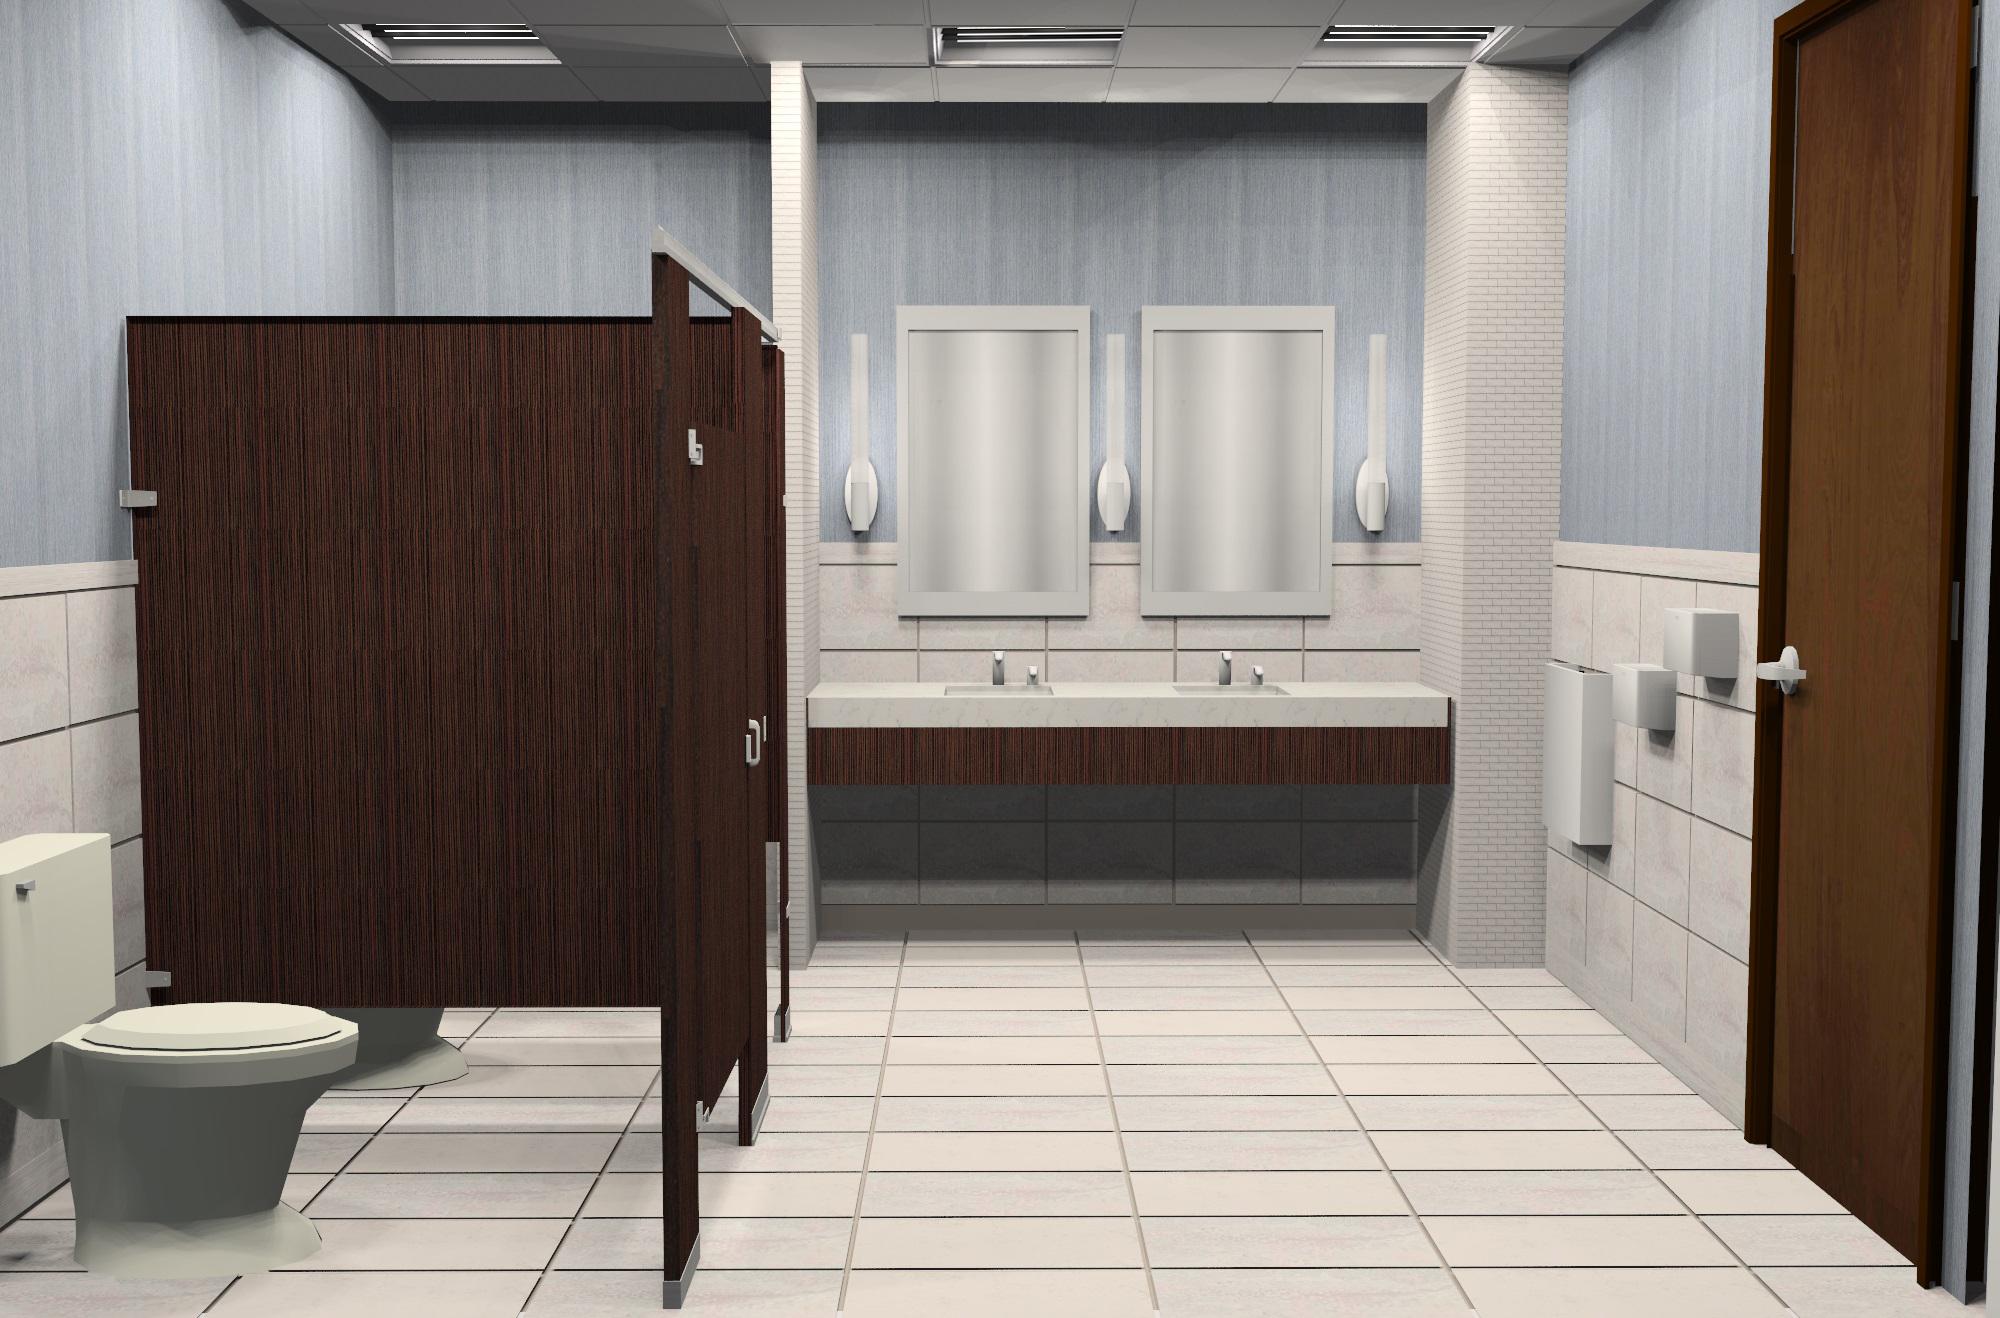 05_Causeway Restroom